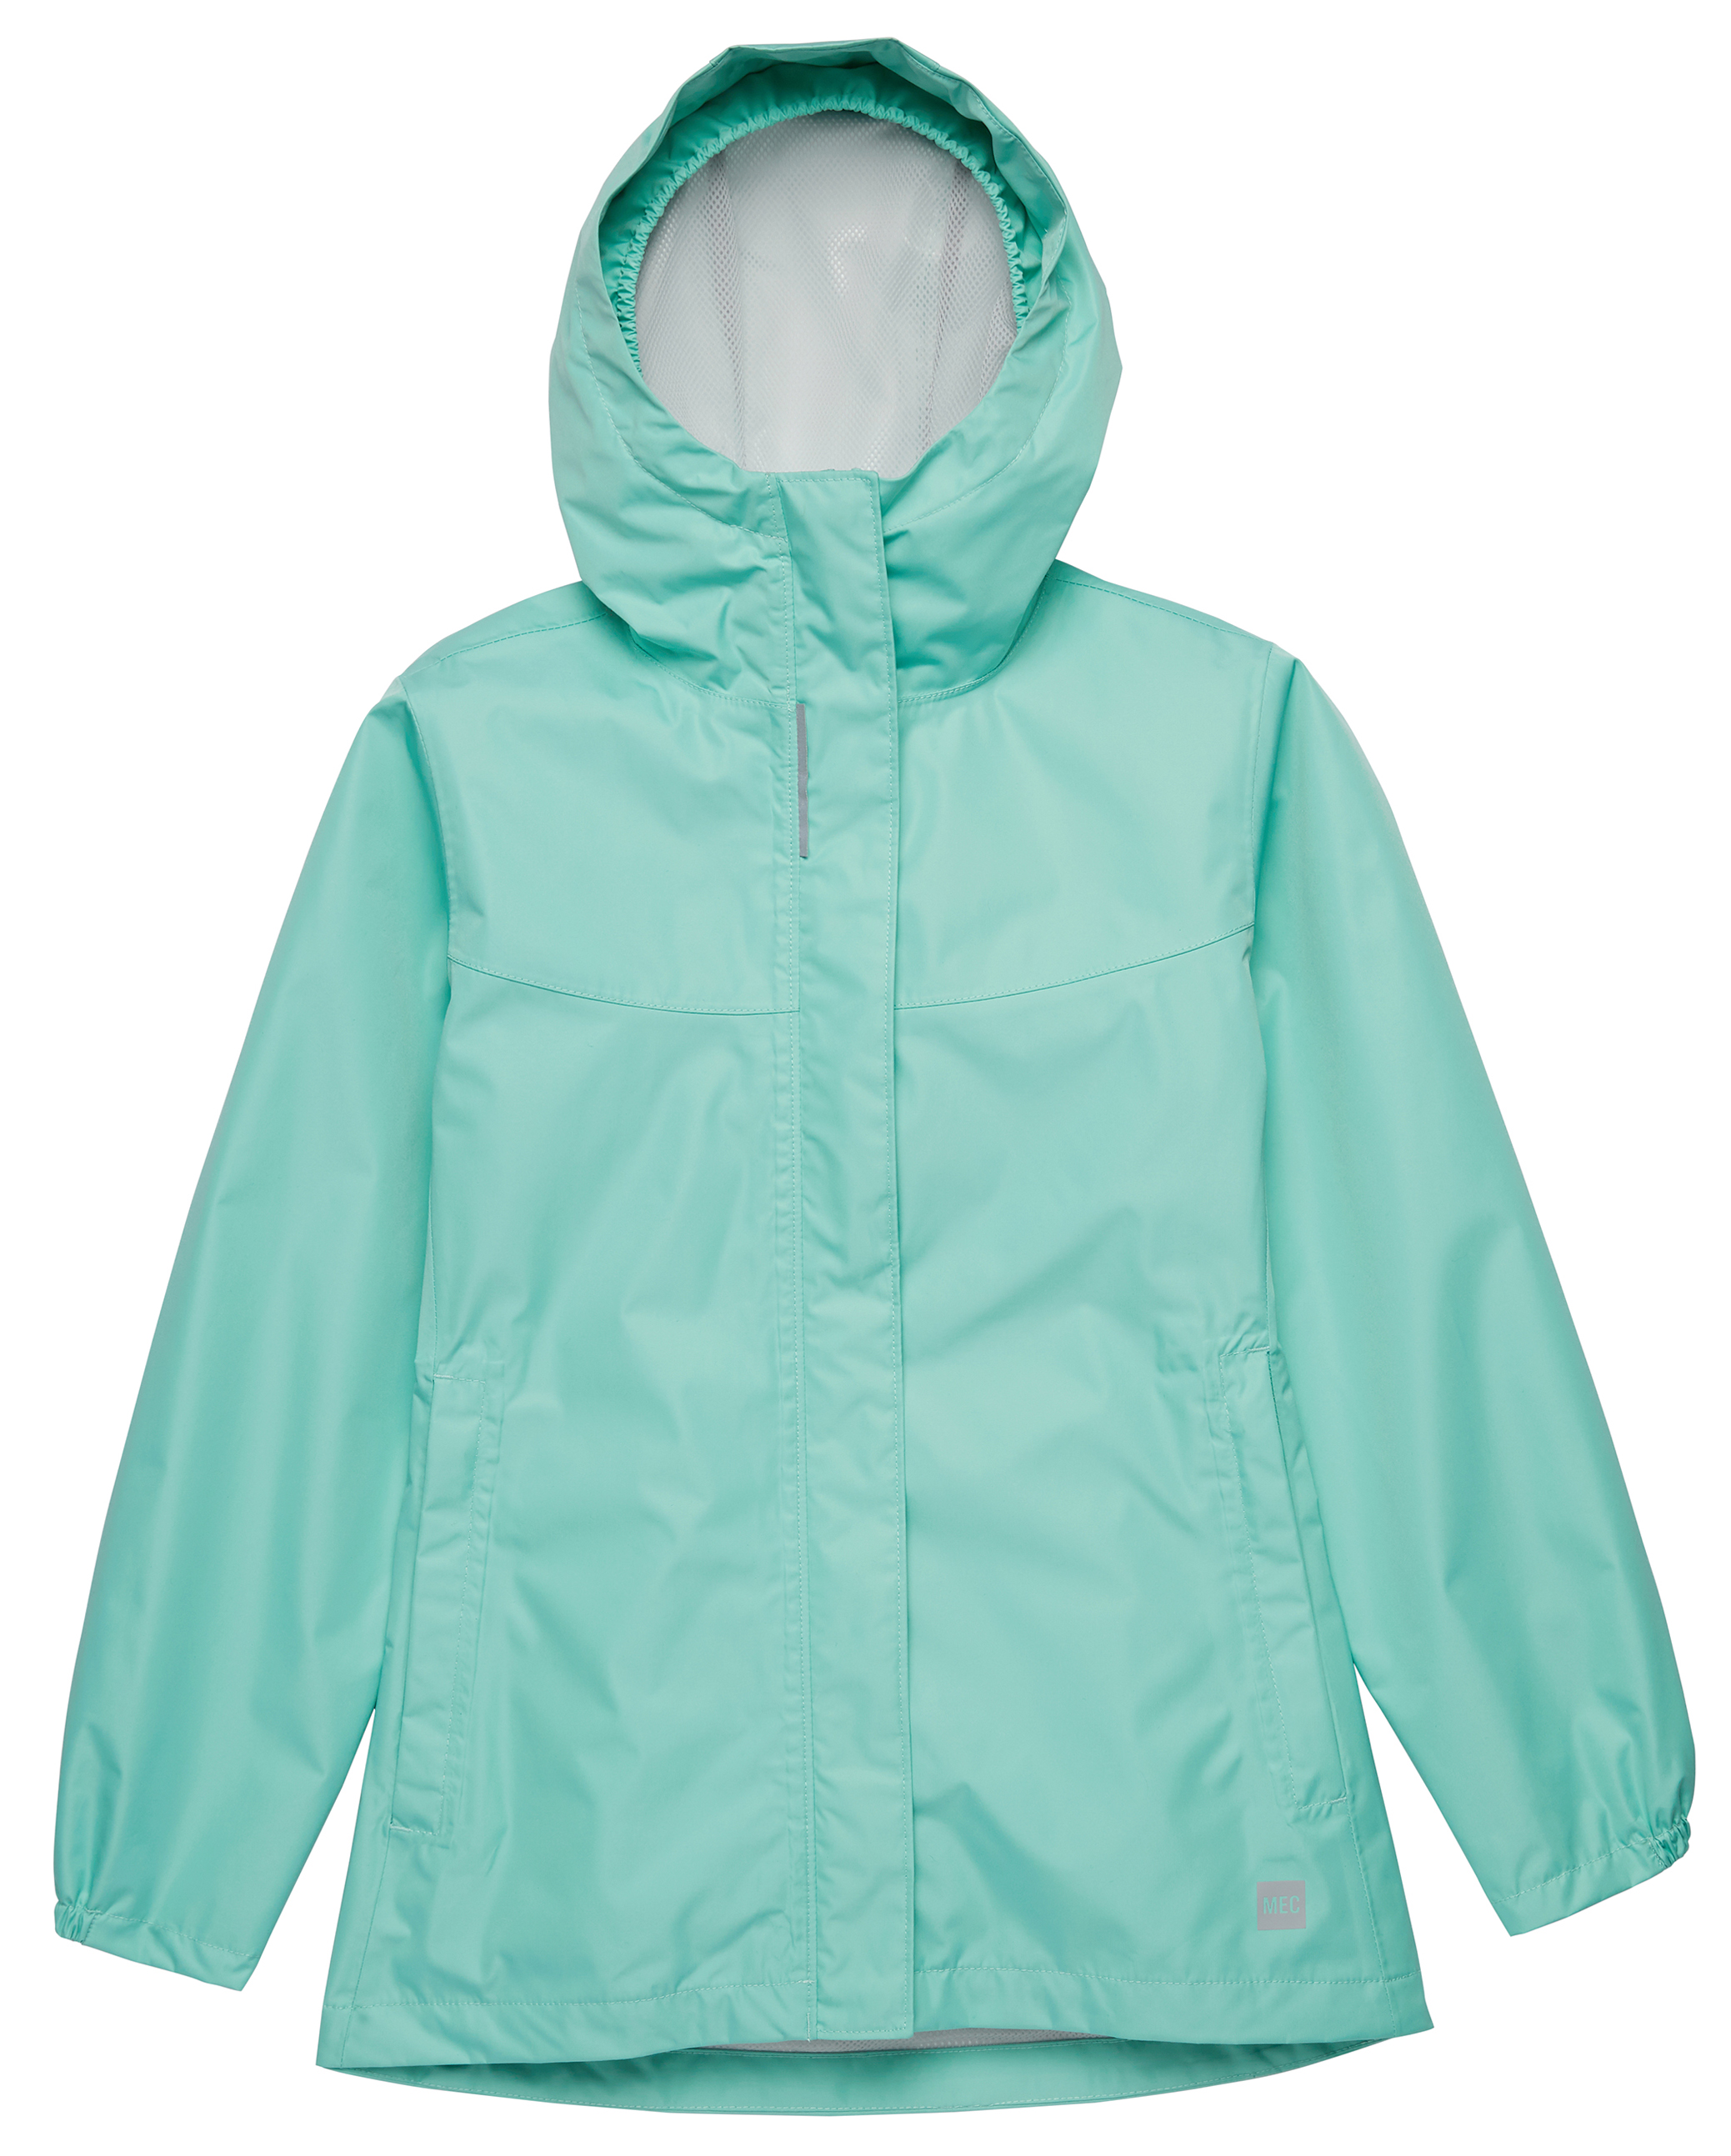 5b35e66cda81 Clothing